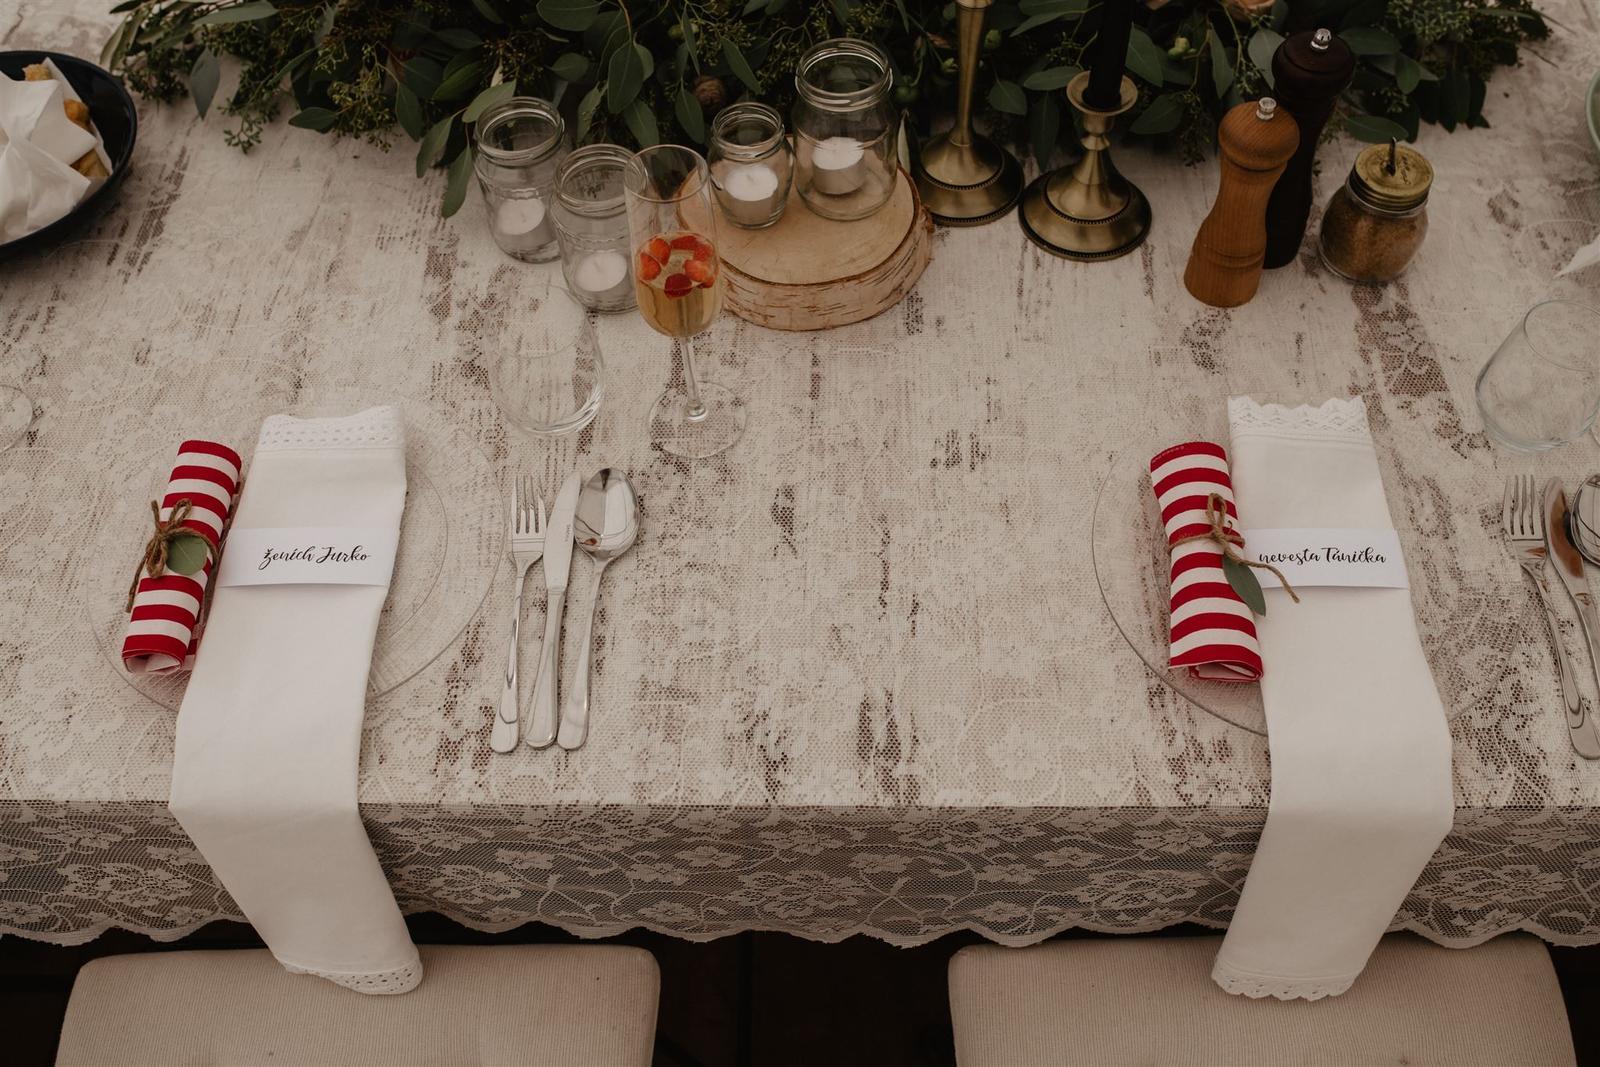 Krásna a romantická svadobná party v záhrade reštaurácie Bistra Dukát - Le Gout v srdci B. Bystrice. - Obrázok č. 7